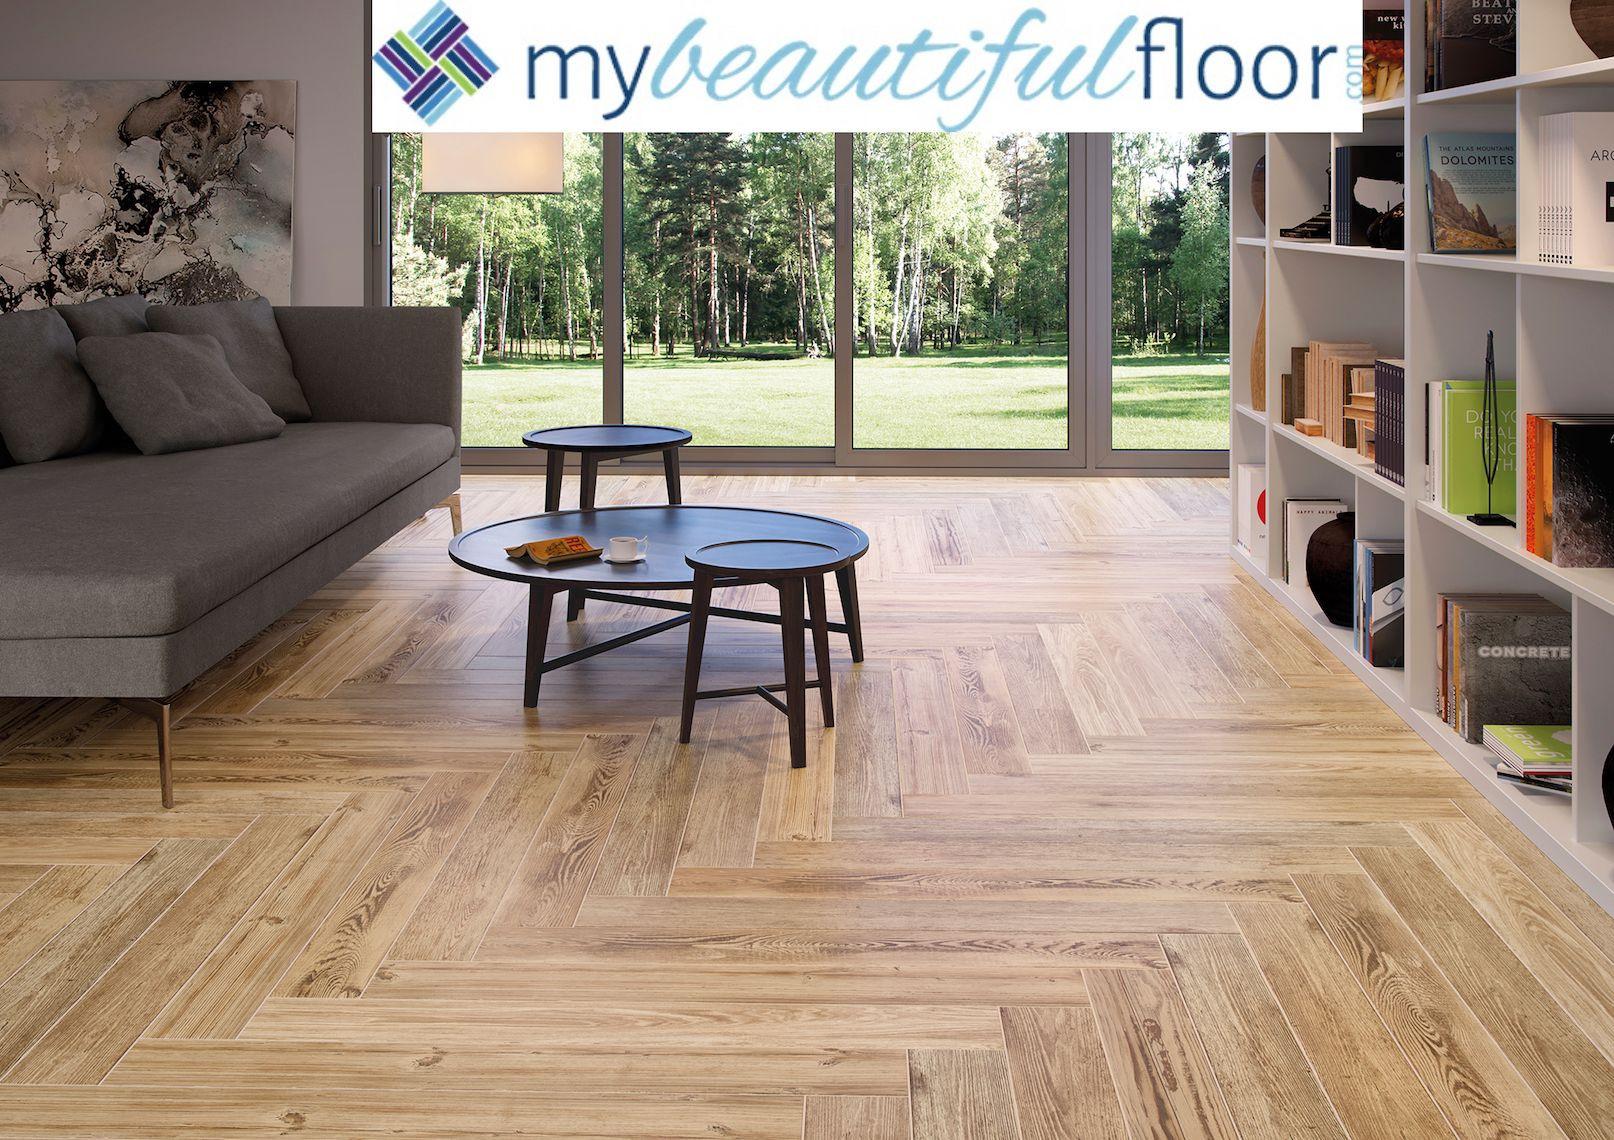 hardwood flooring retailers toronto of my beautiful floor com monterosantiago on pinterest in 8c6e0d272cbeefeedf75f5aff2fa1a18